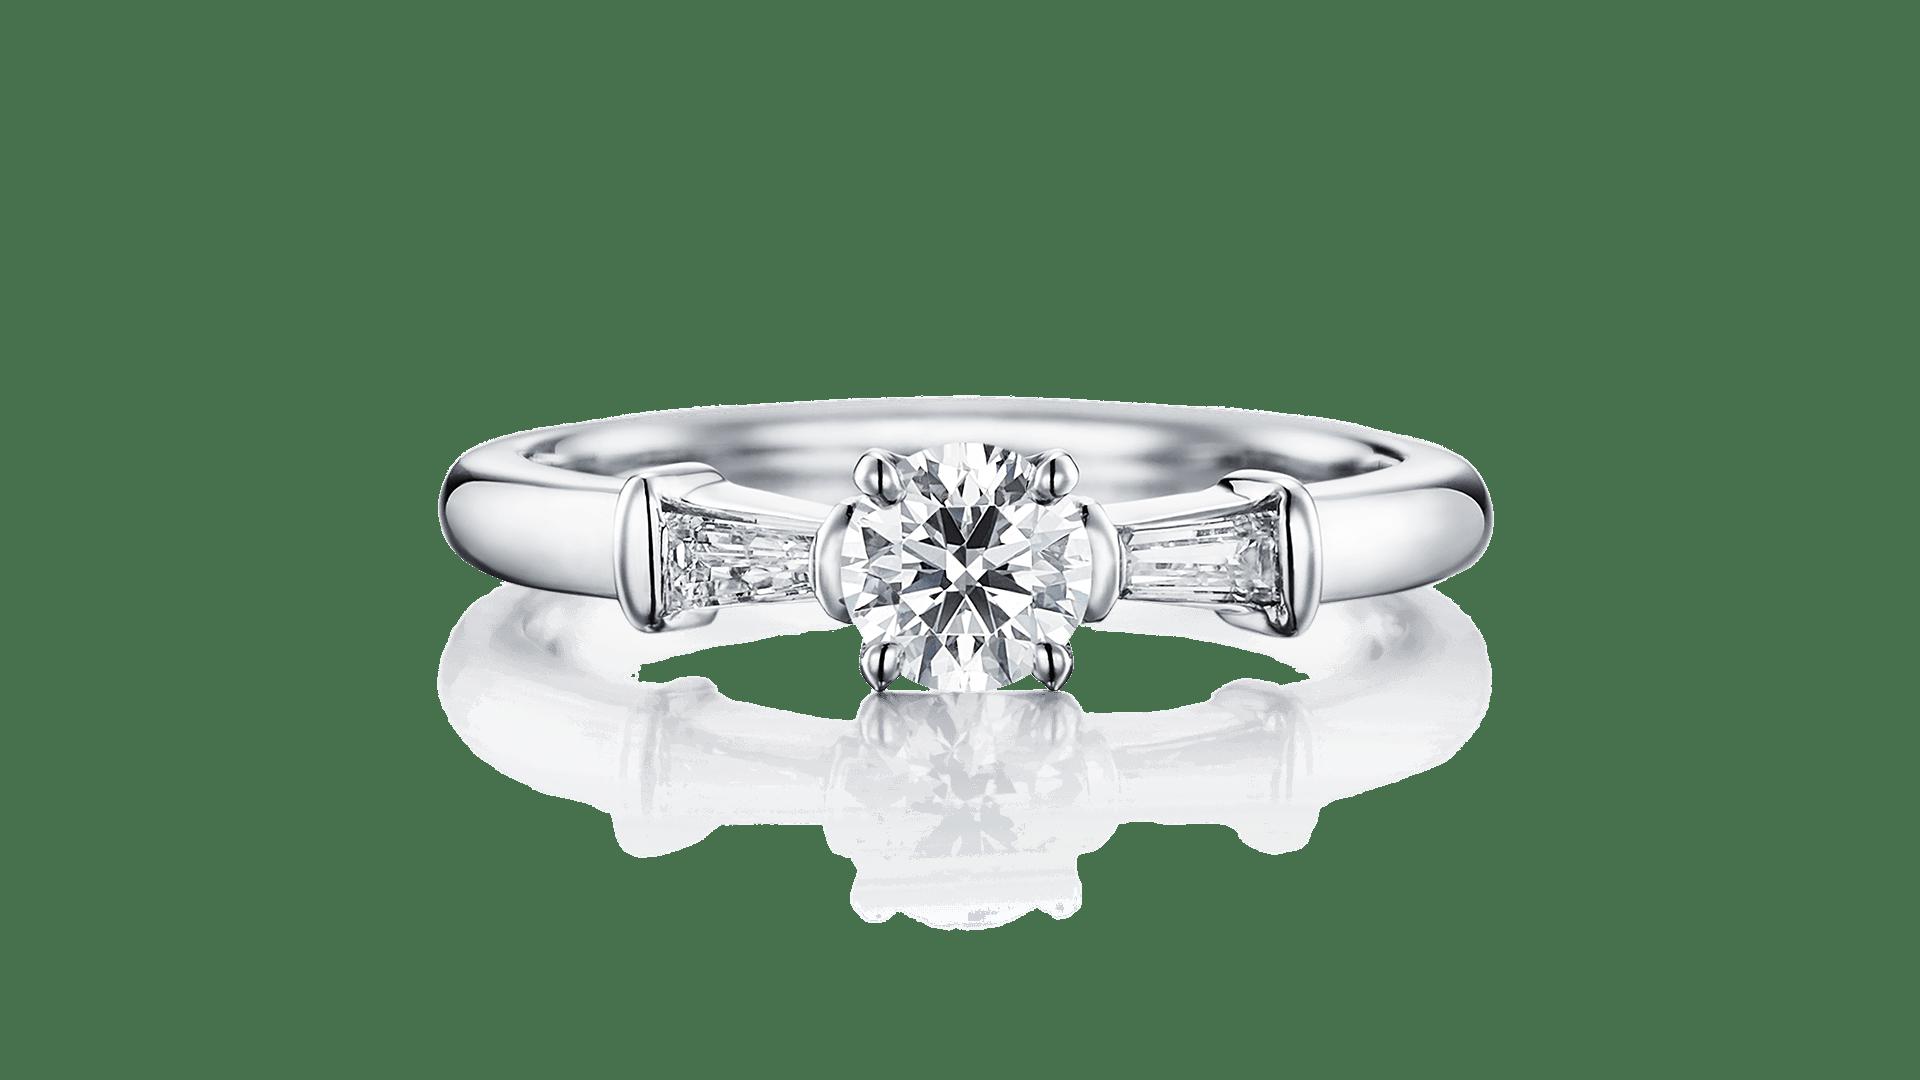 shaula シャウラ | 婚約指輪サムネイル 1